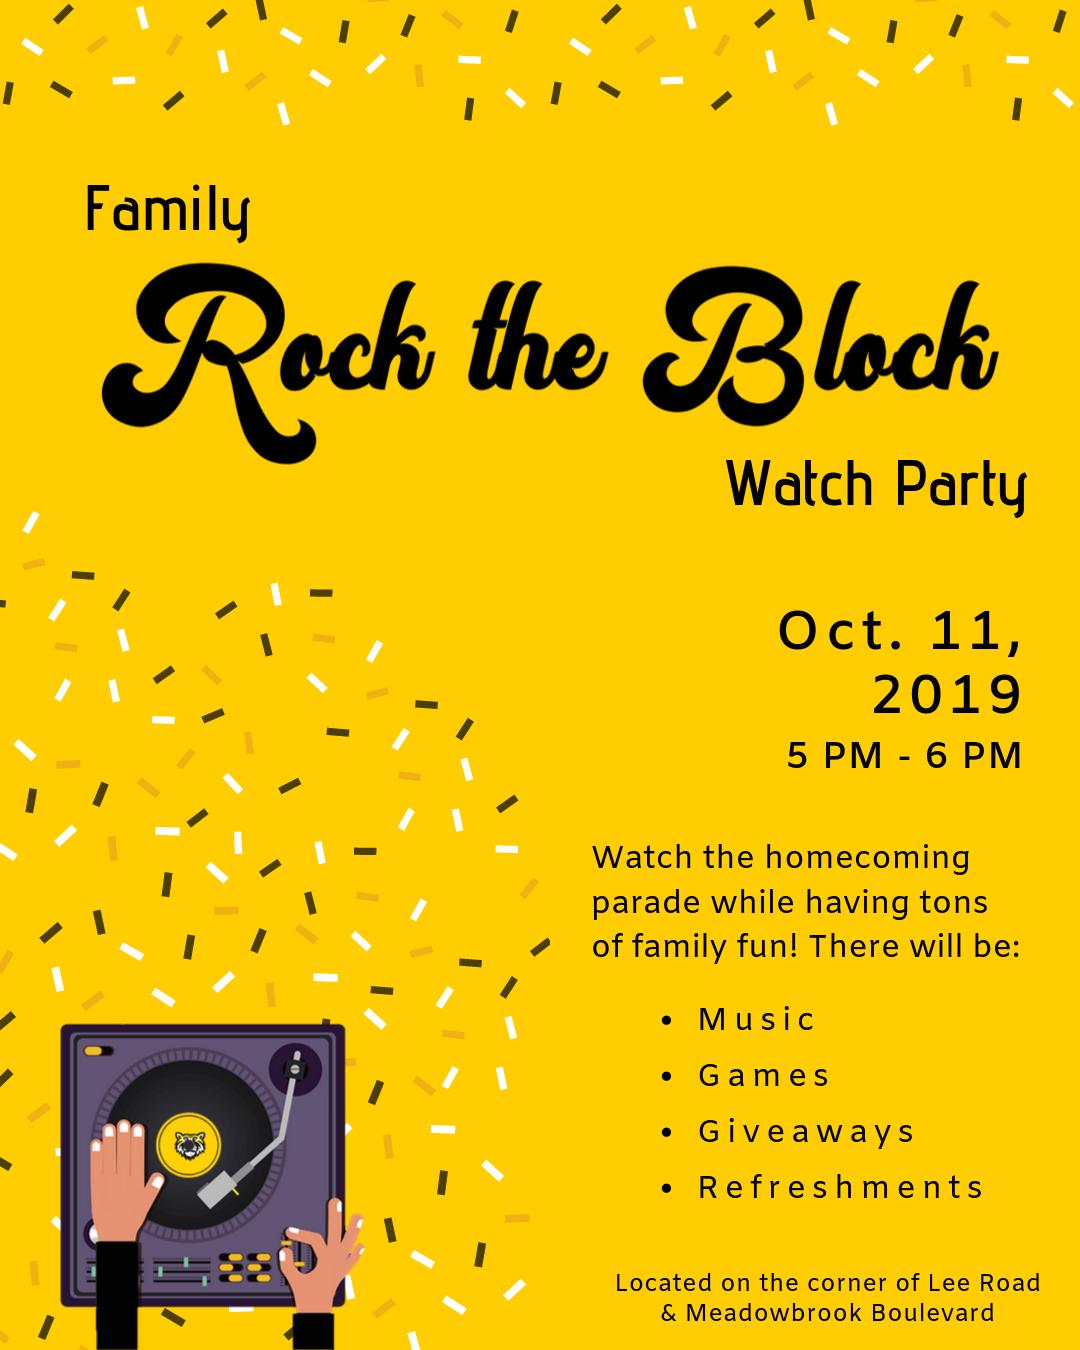 rock the block flyer